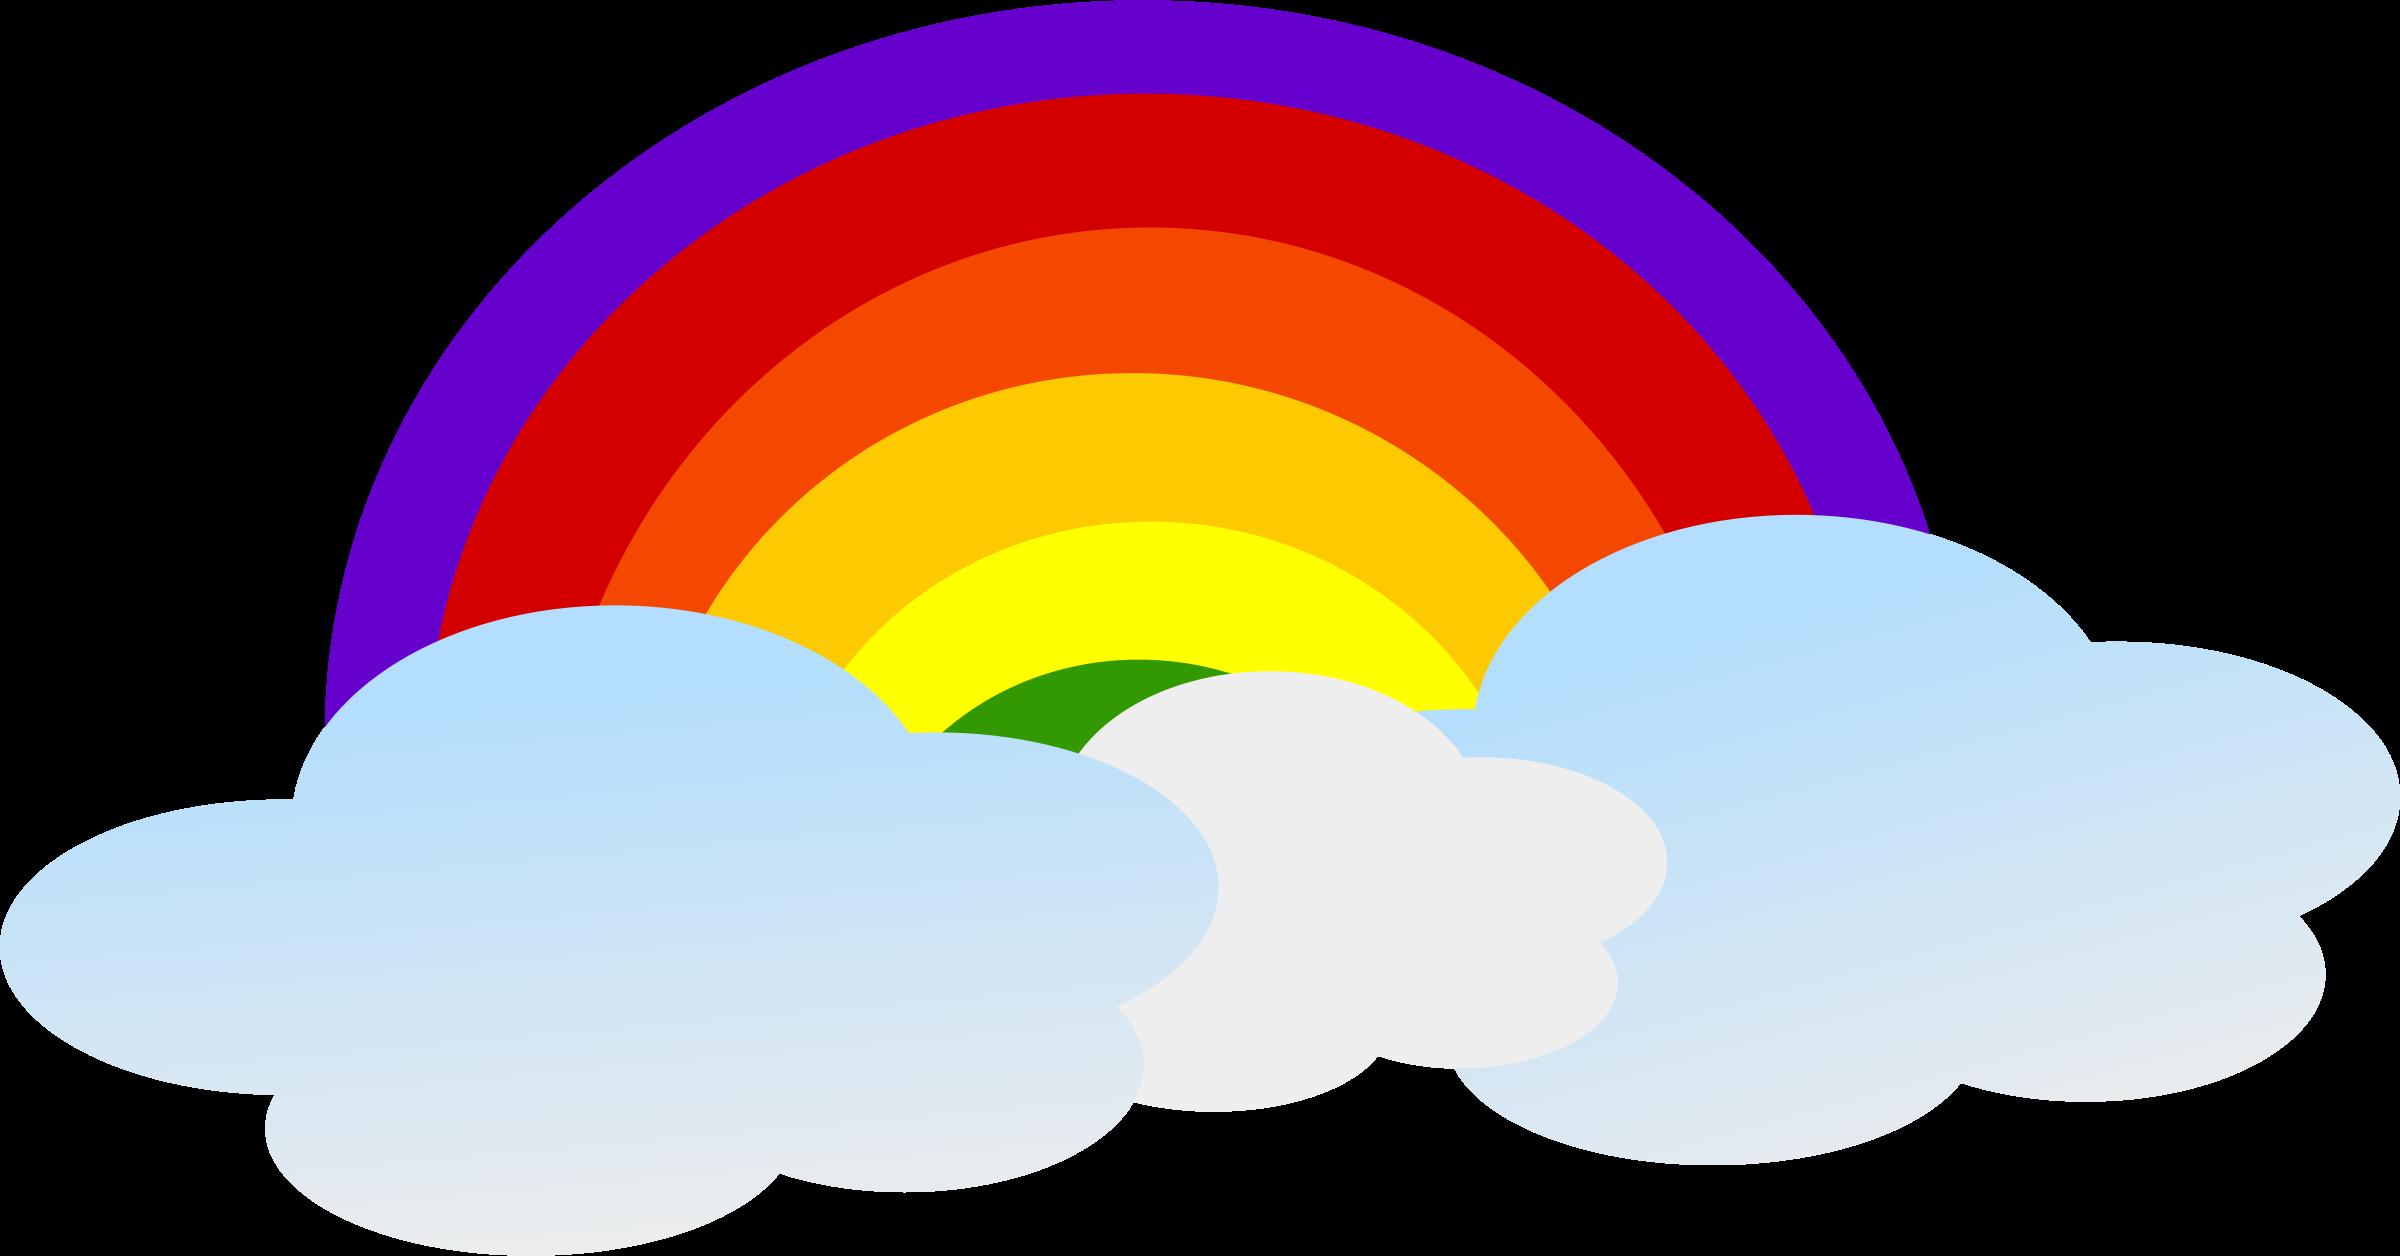 2400x1256 Rainbow Clip Art Rainbow Images Clipartix 2